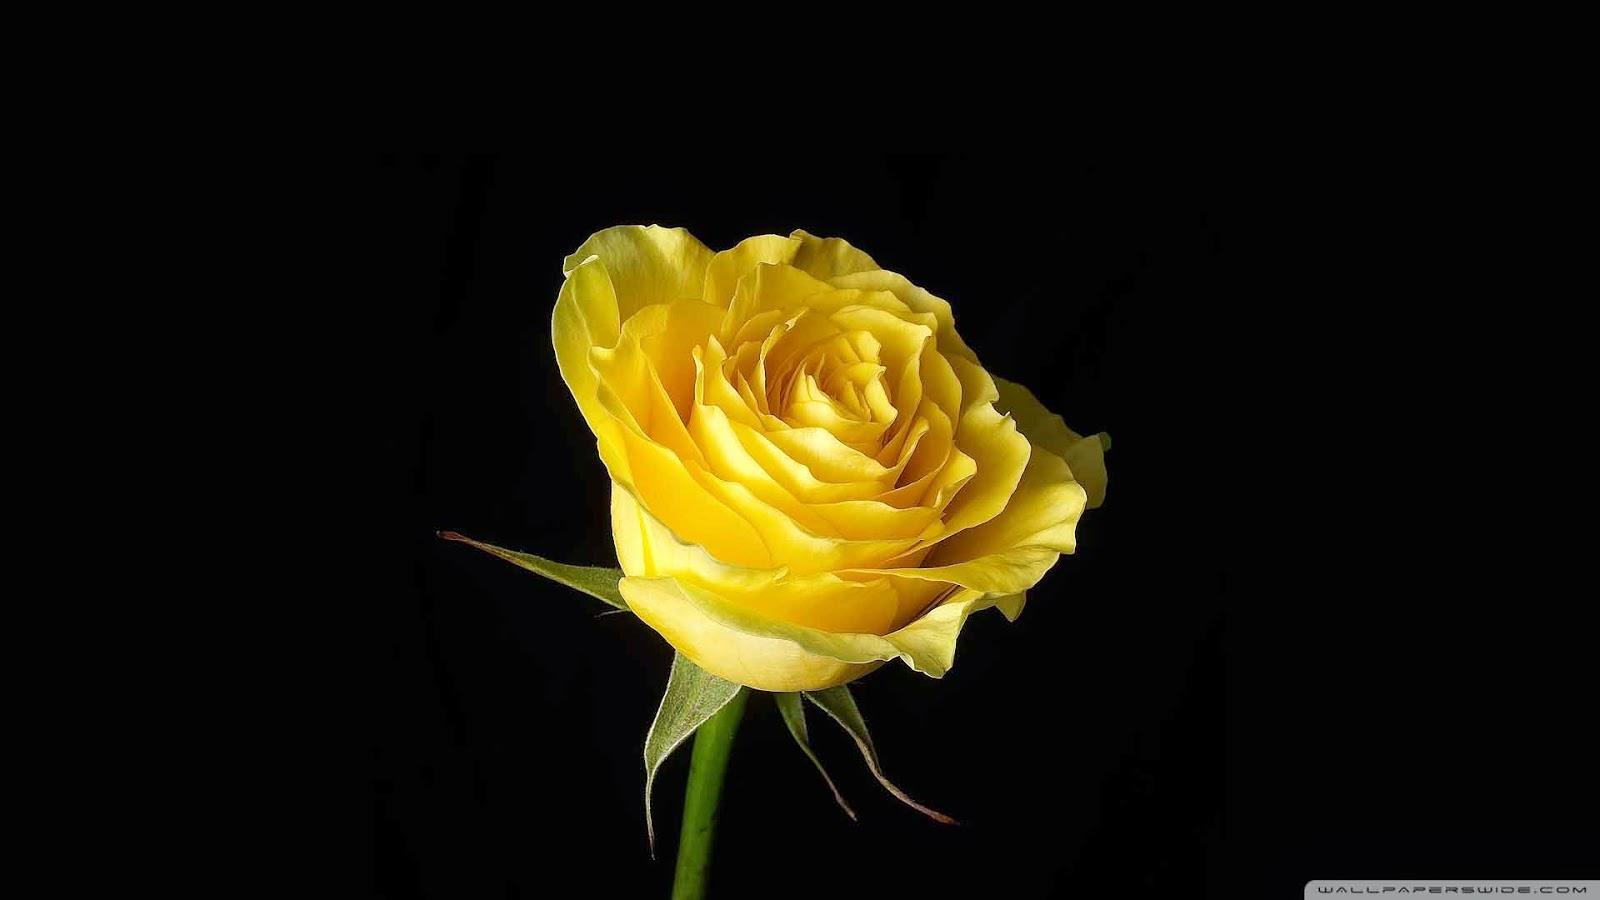 yellow rose on black background wallpaper